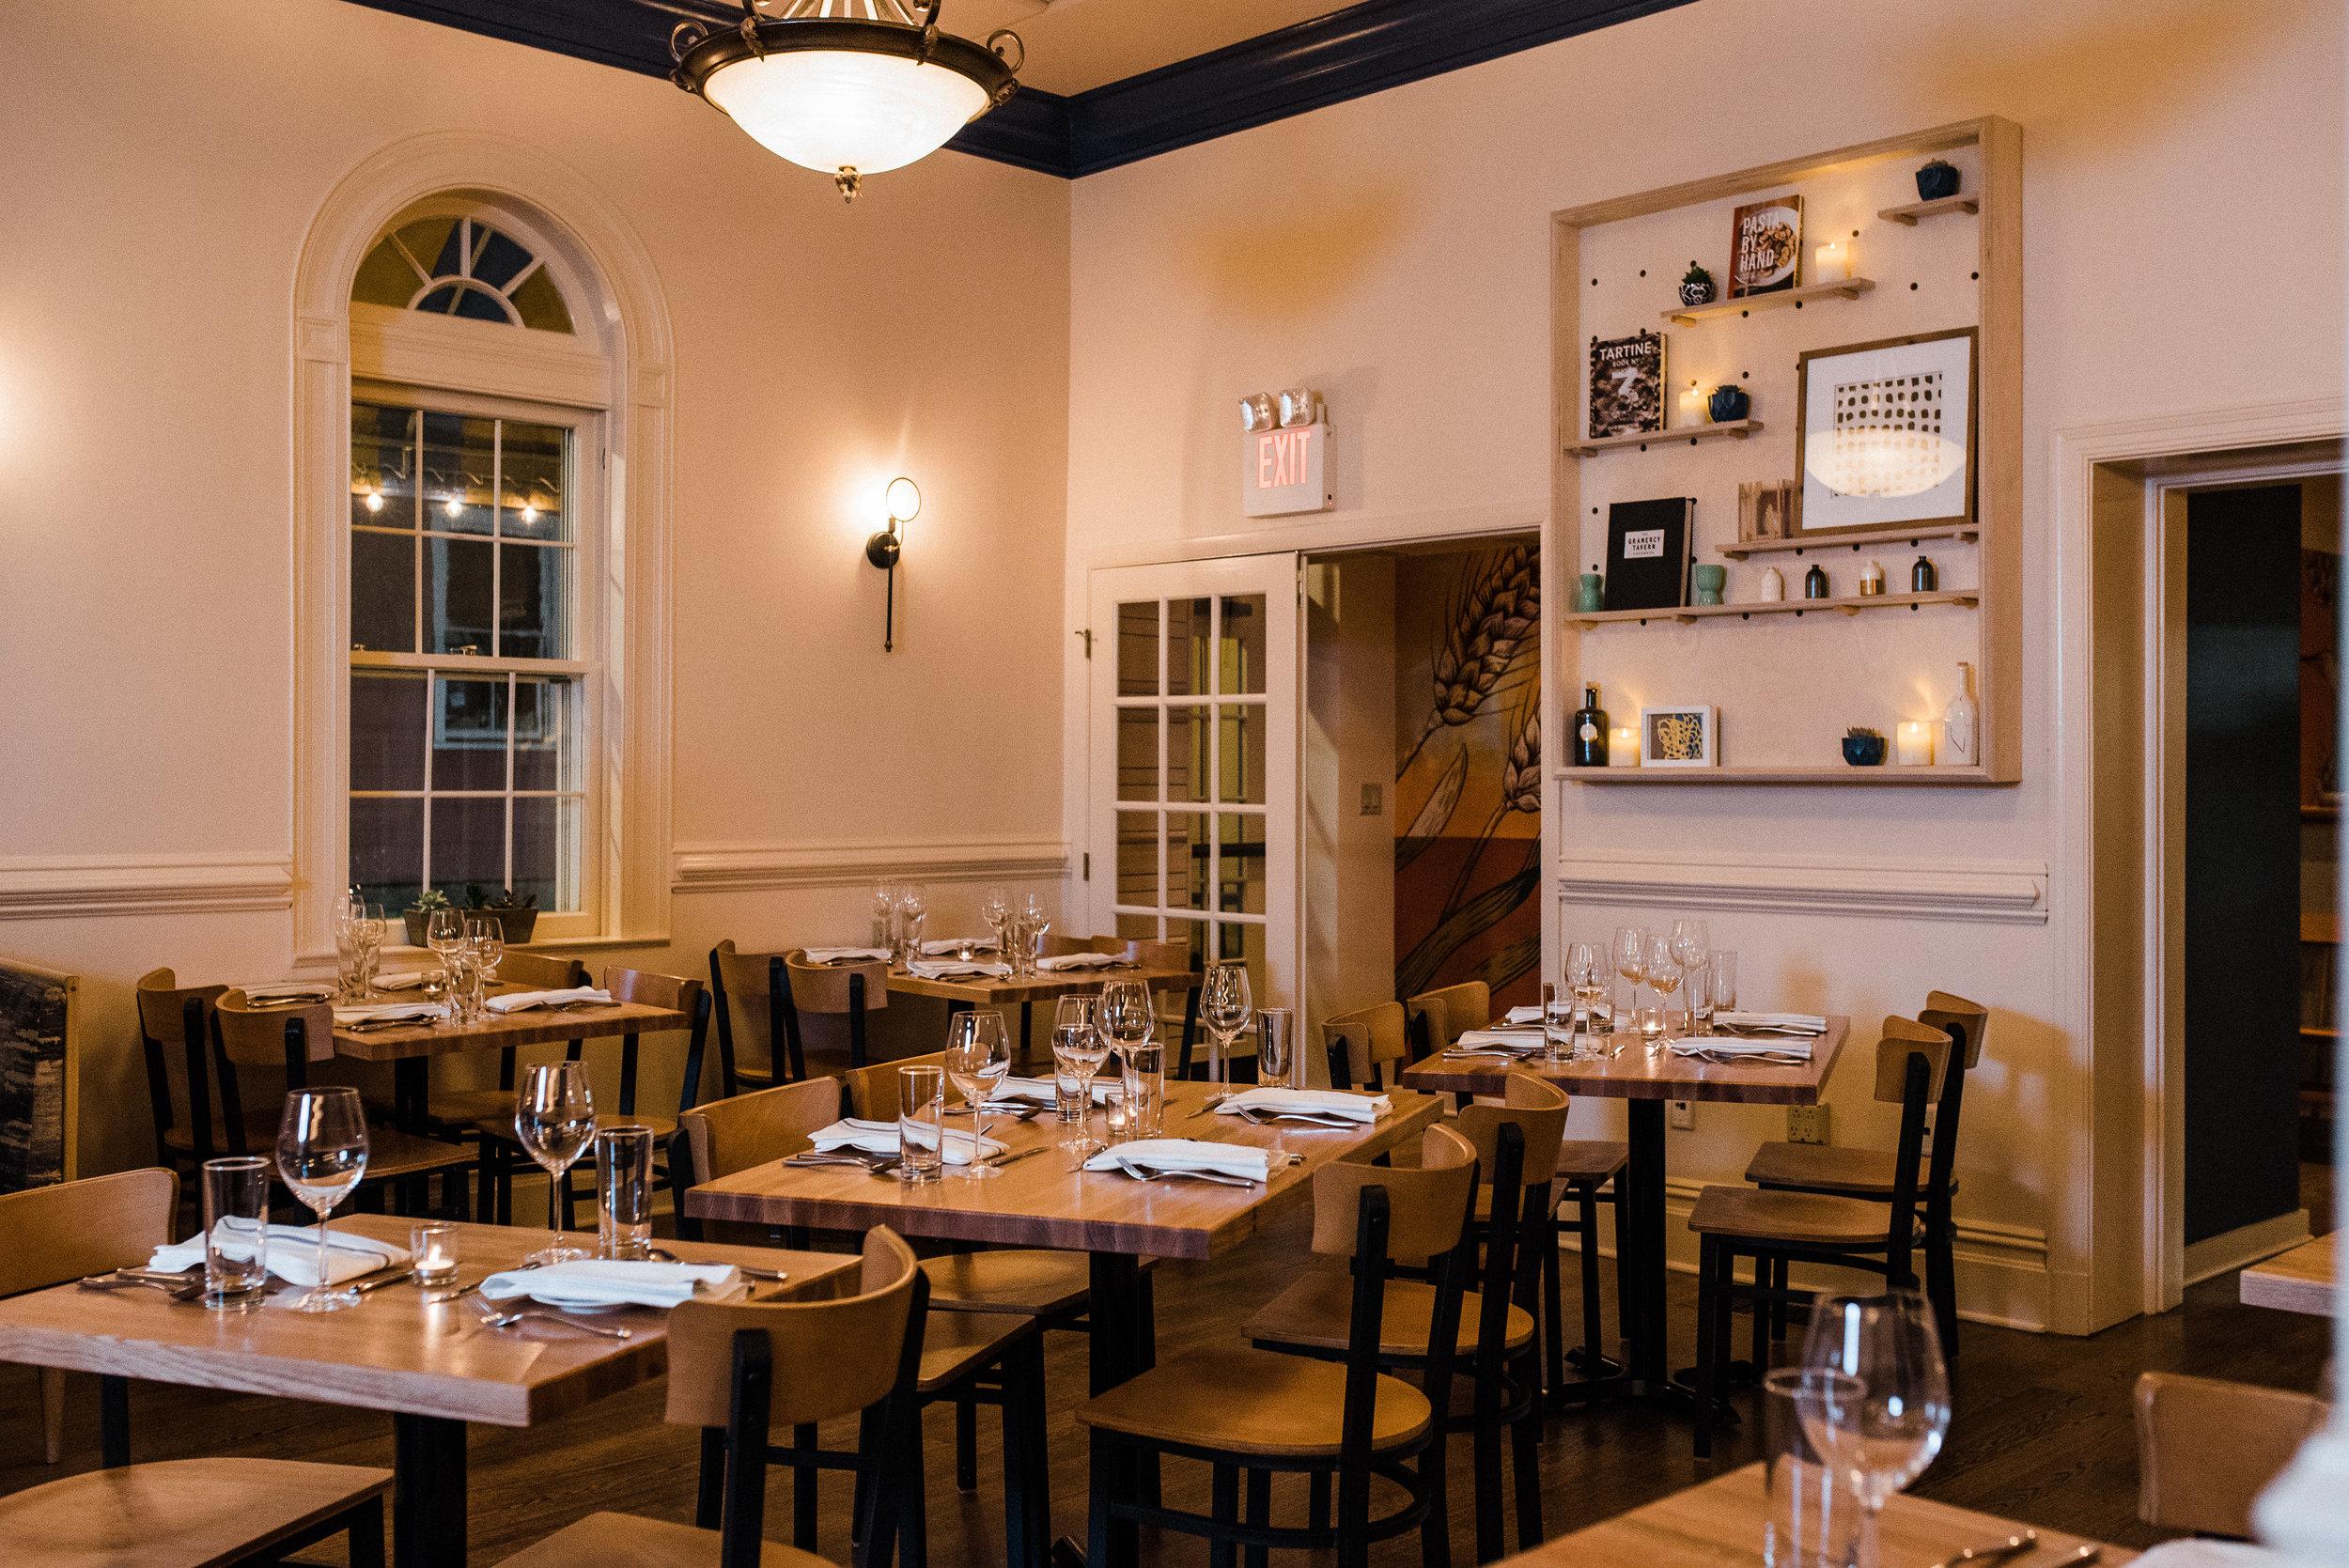 2017.11.04_GranoArso-Restaurant-4606.jpg